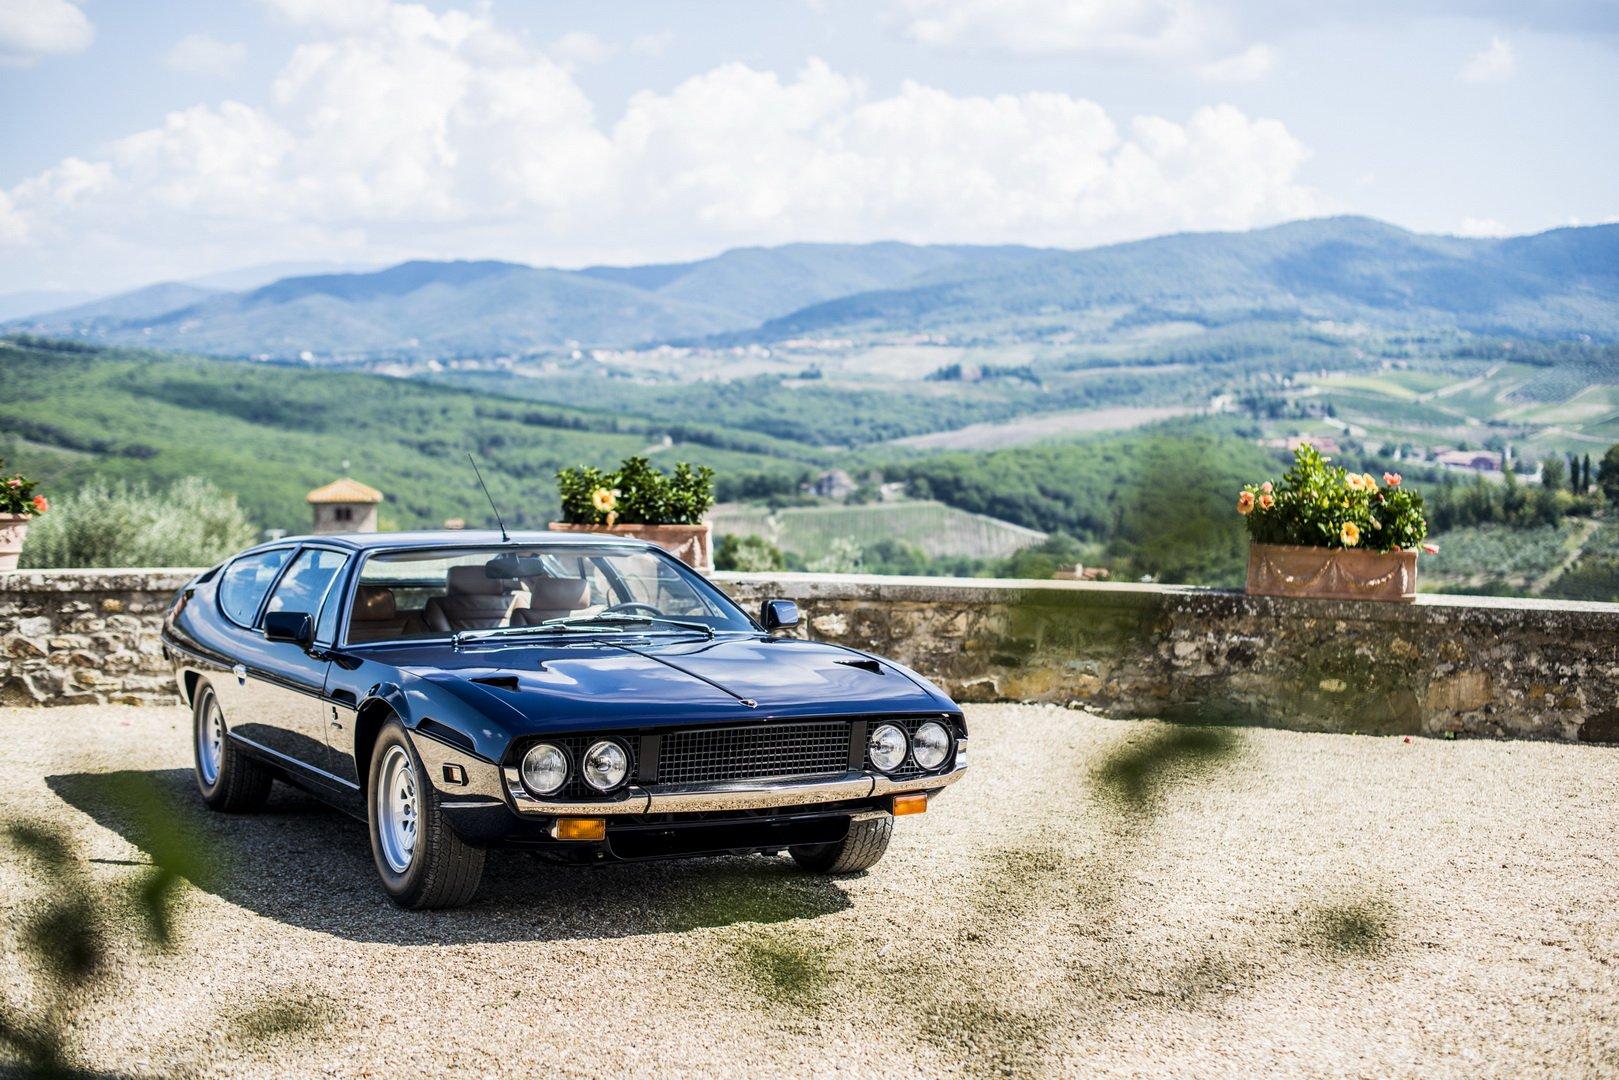 Lamborghini Islero and Espada 50th anniversary (17)